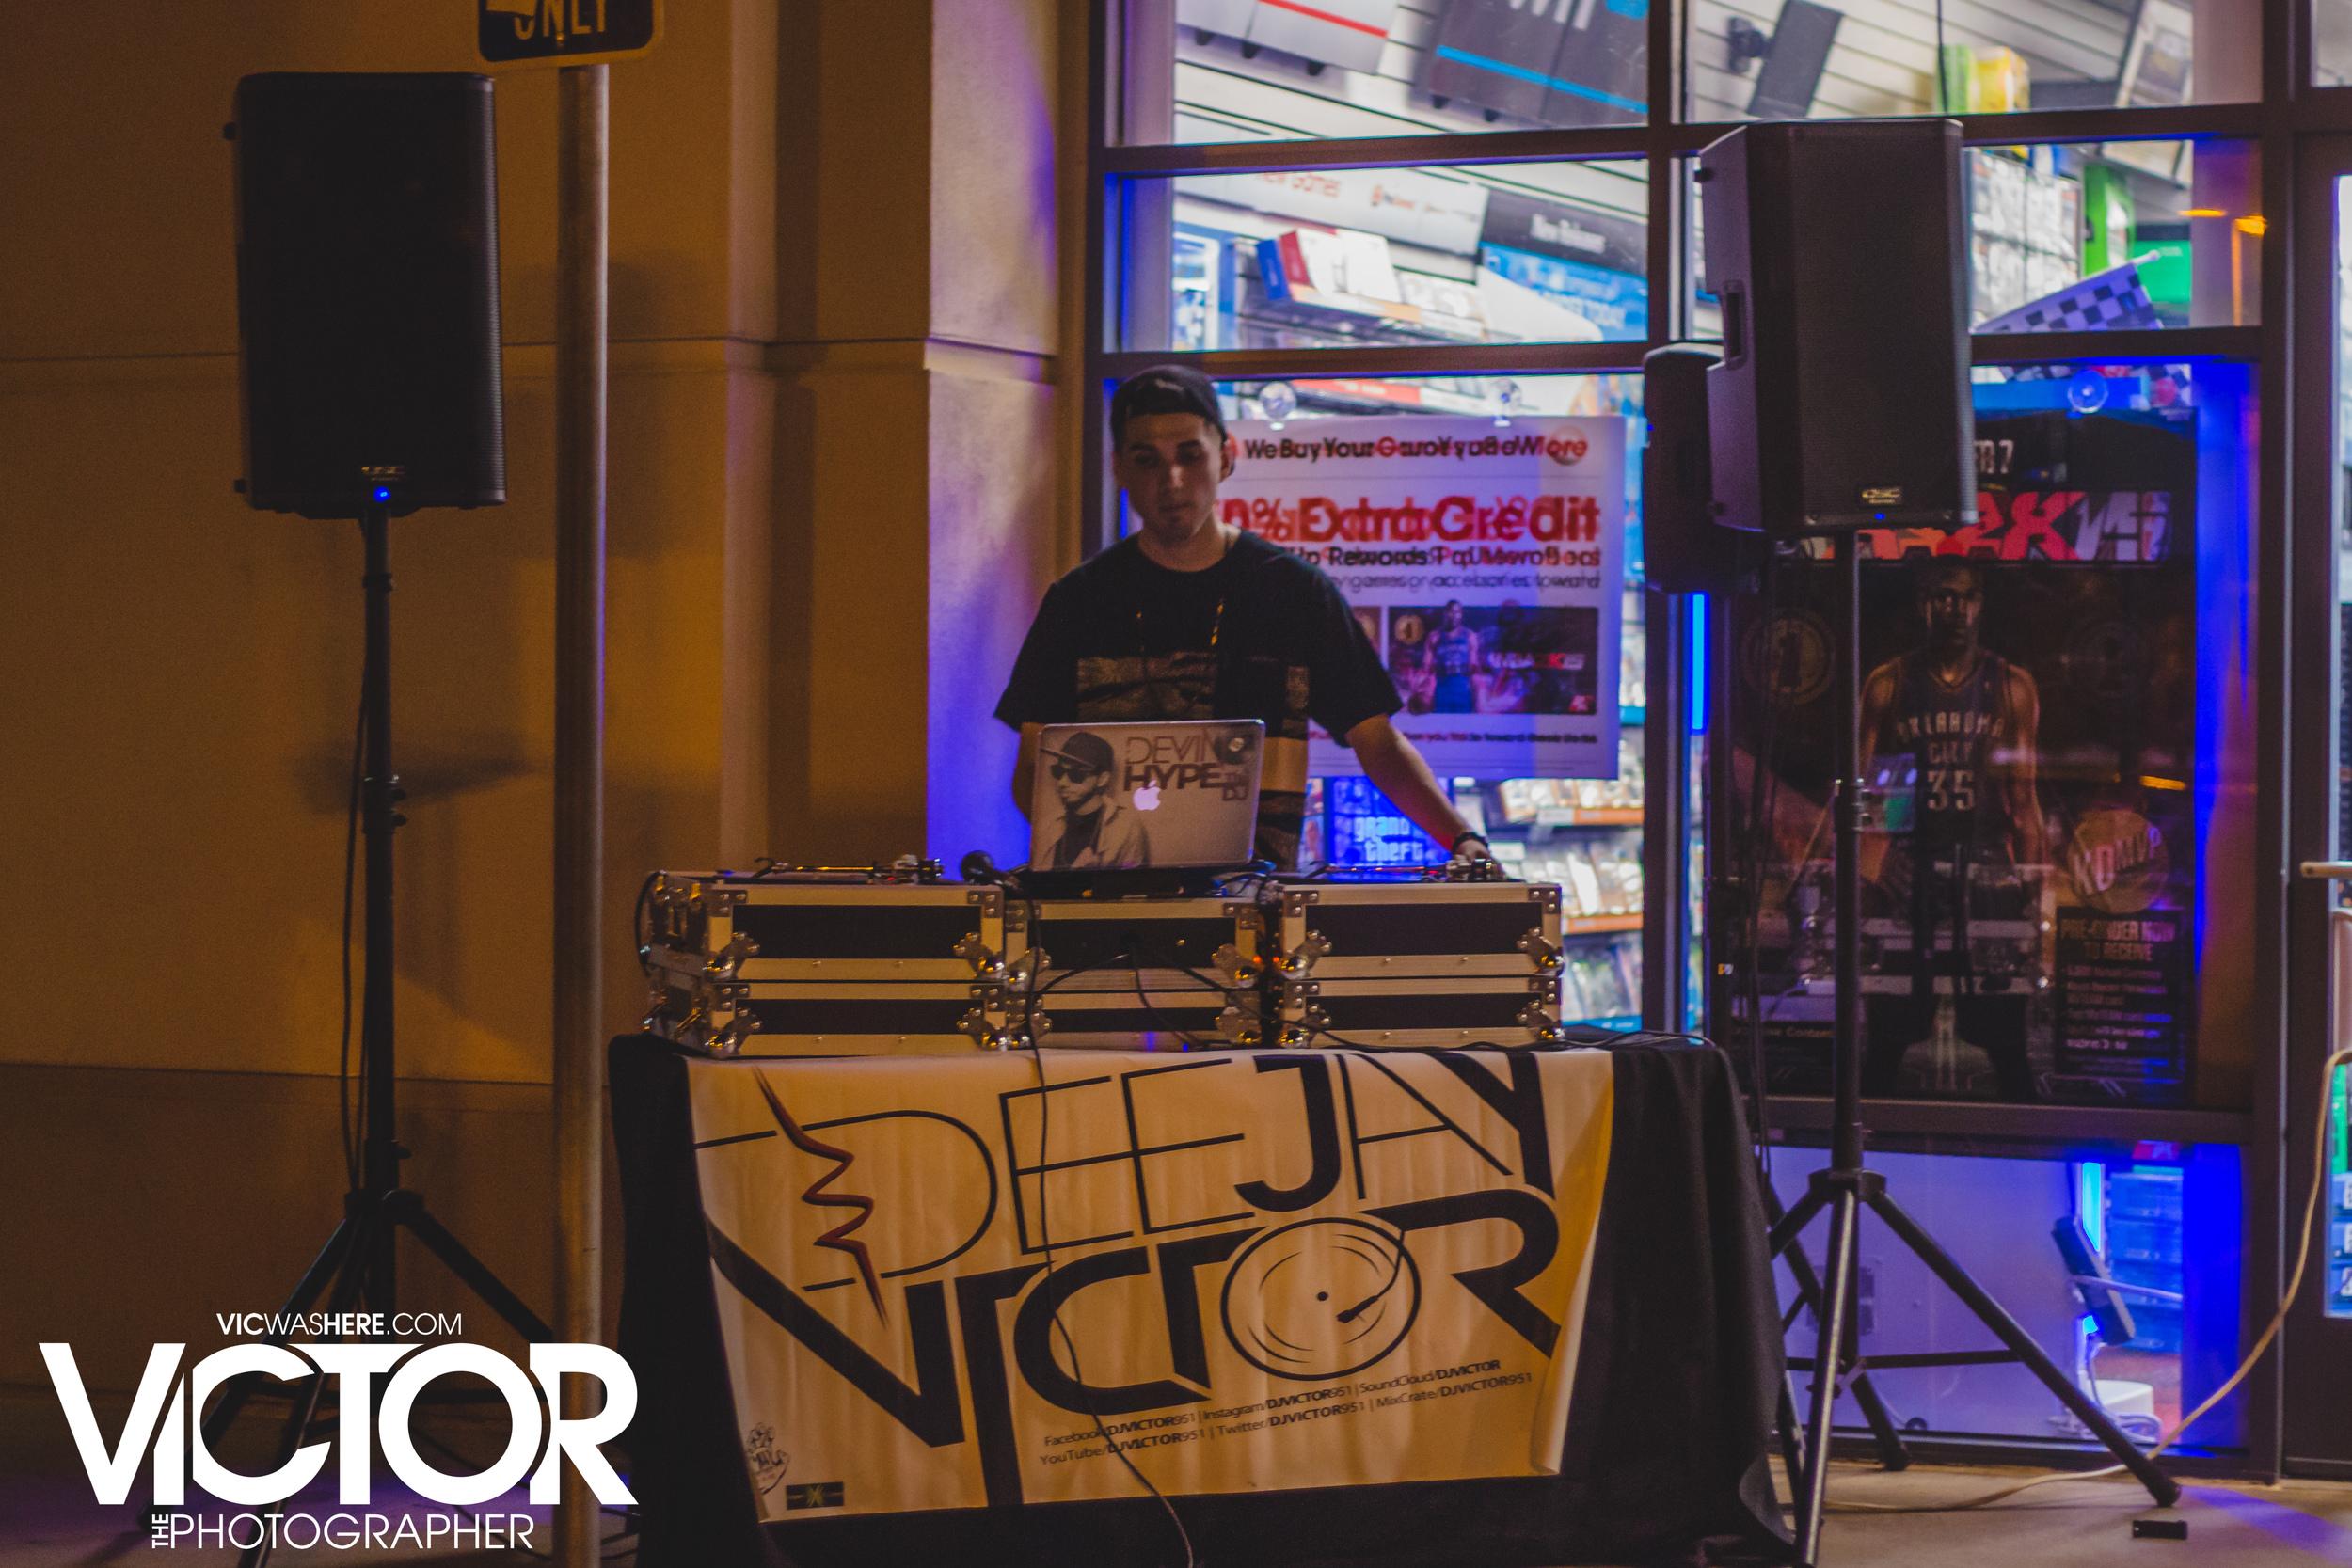 DJ VICTOR x TDUB ent x Victor The Photographer x VICWASHERE x Devin Hype